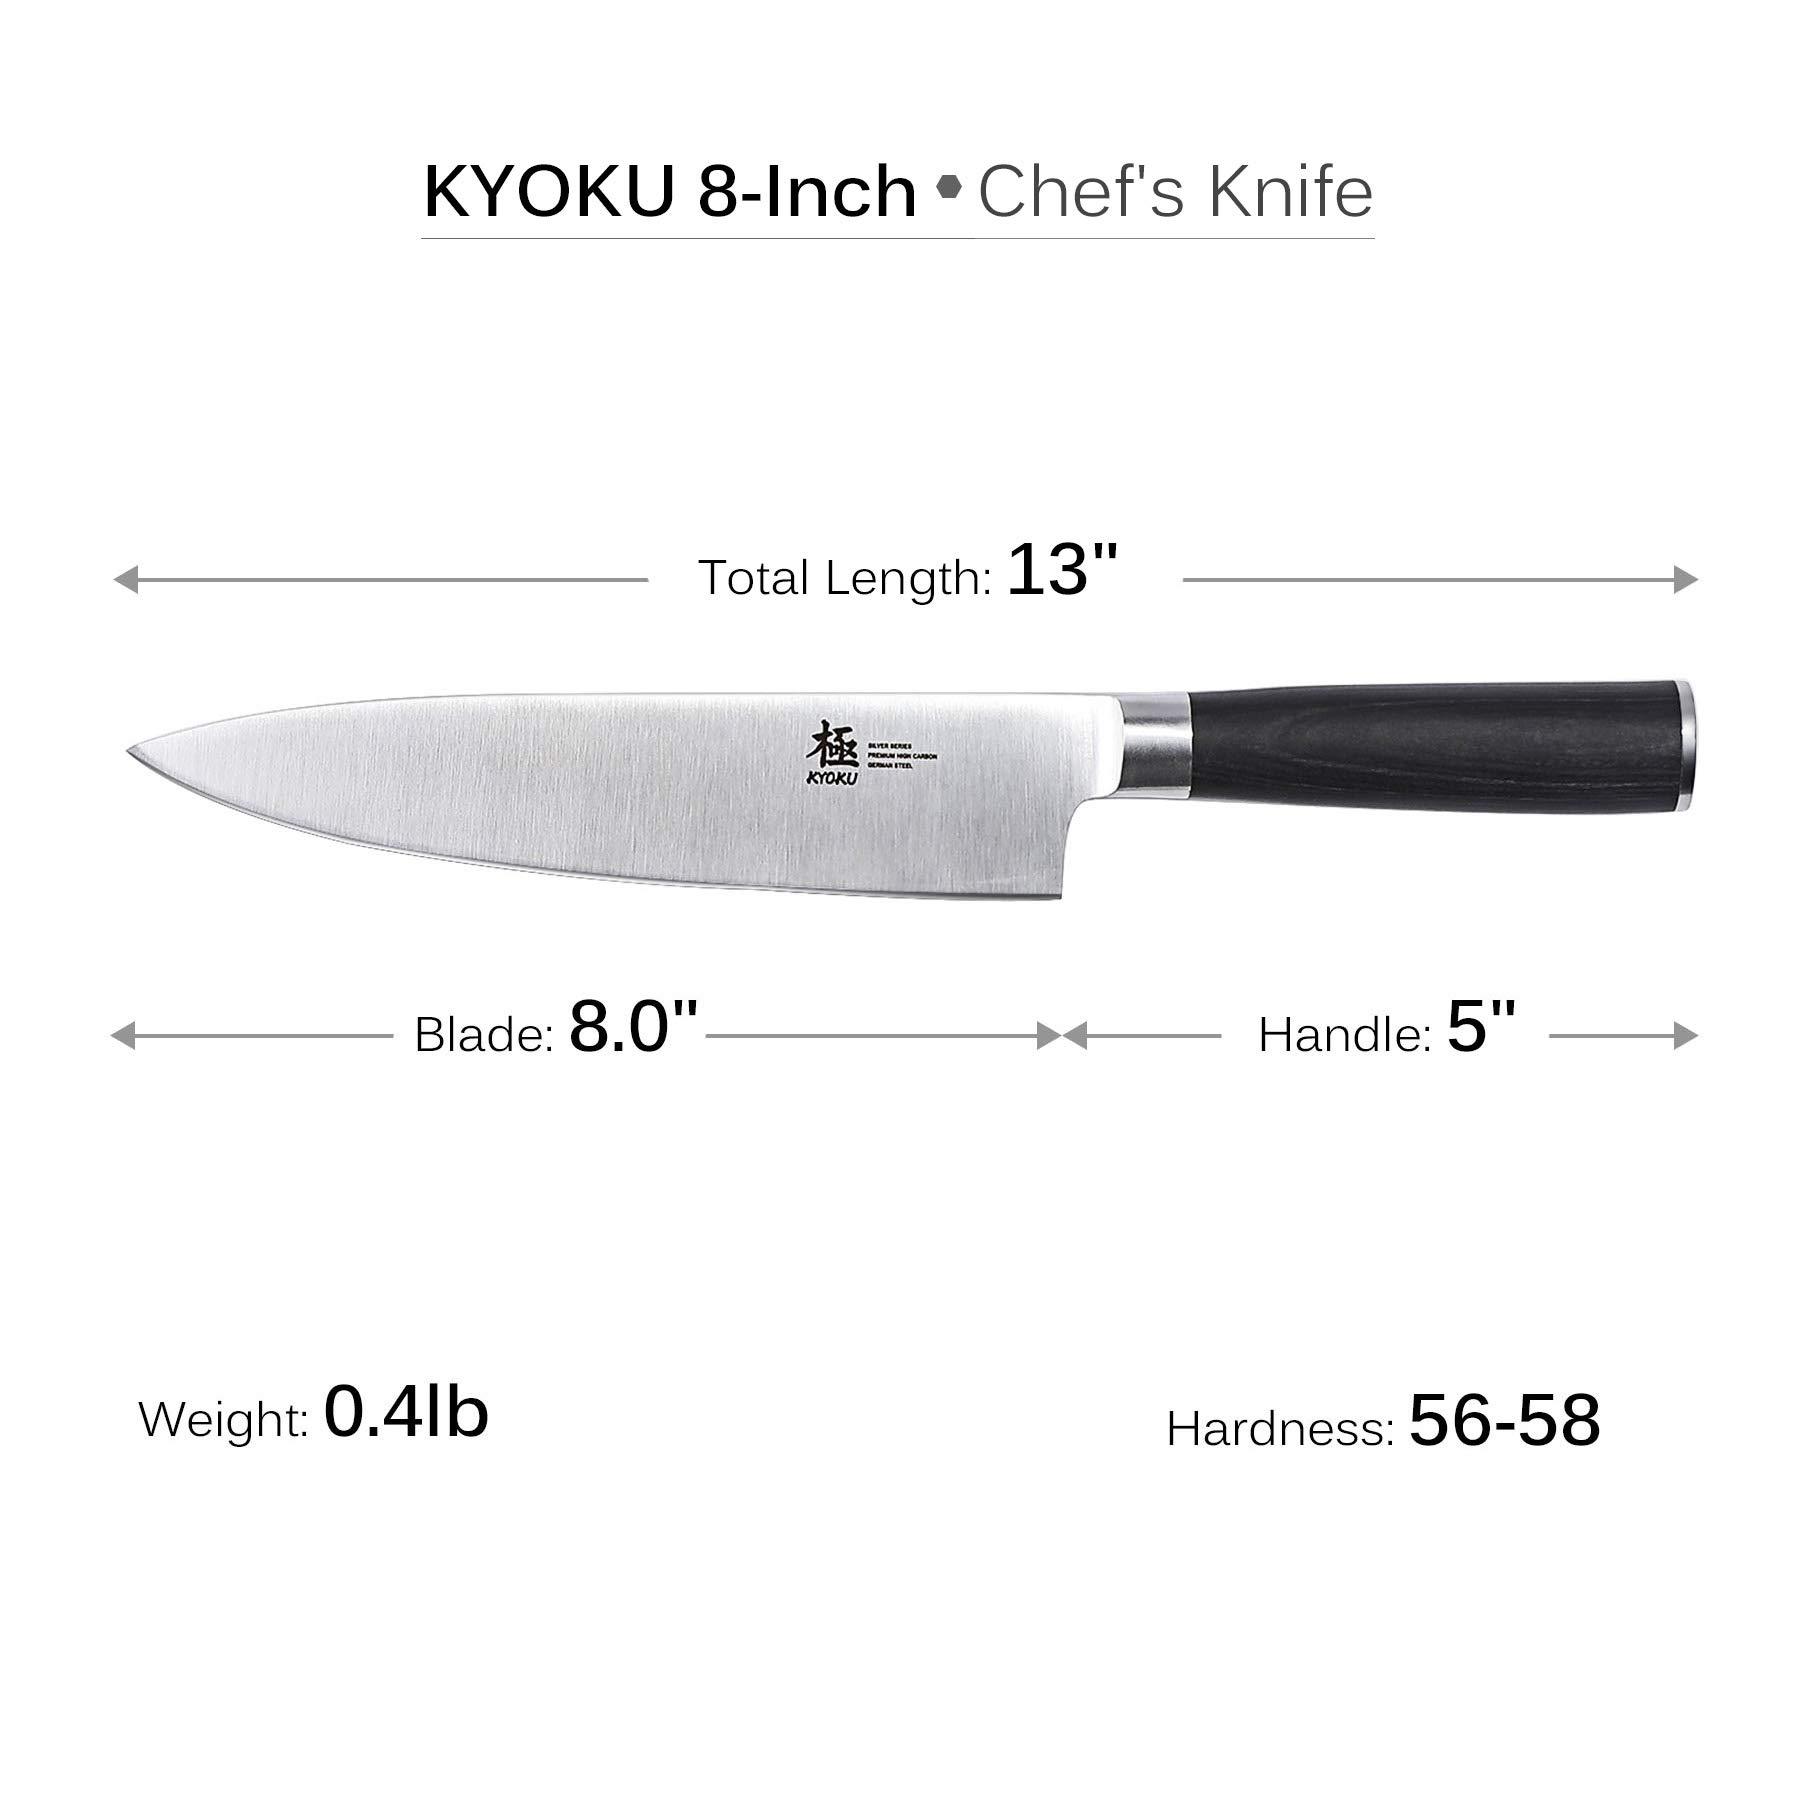 KYOKU Samurai Series - Chef Knife 8'' with Sheath Case - Japanese Steel - Ultra Sharp Blade Ergonomic Pakkawood Handle by KYOKU (Image #4)